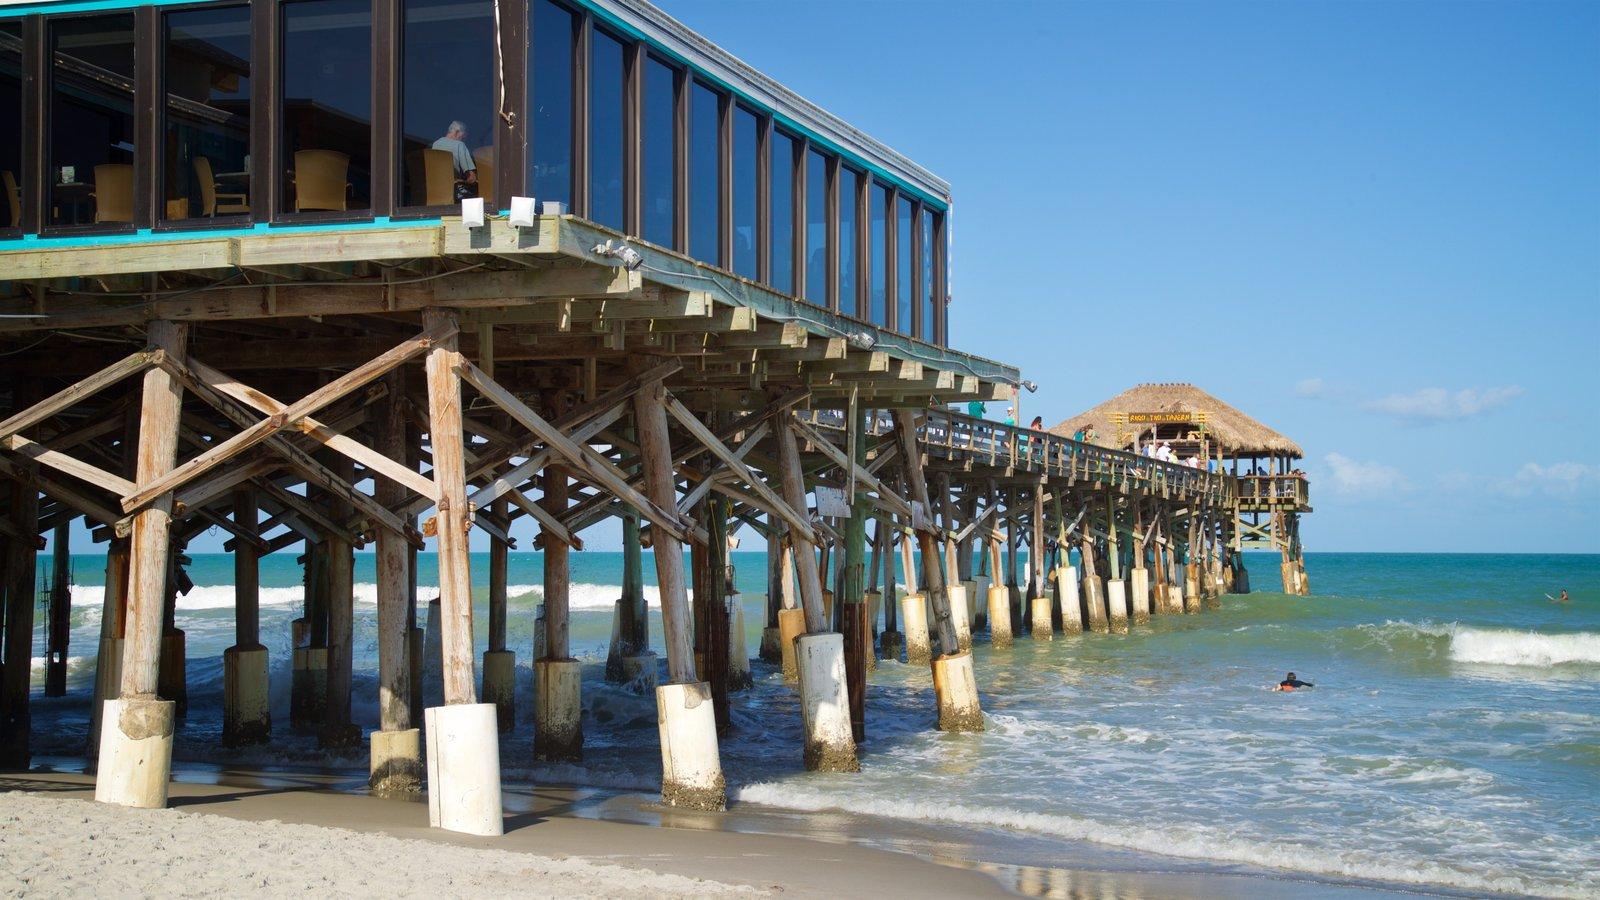 Cocoa Beach Pier which includes a sandy beach and general coastal views